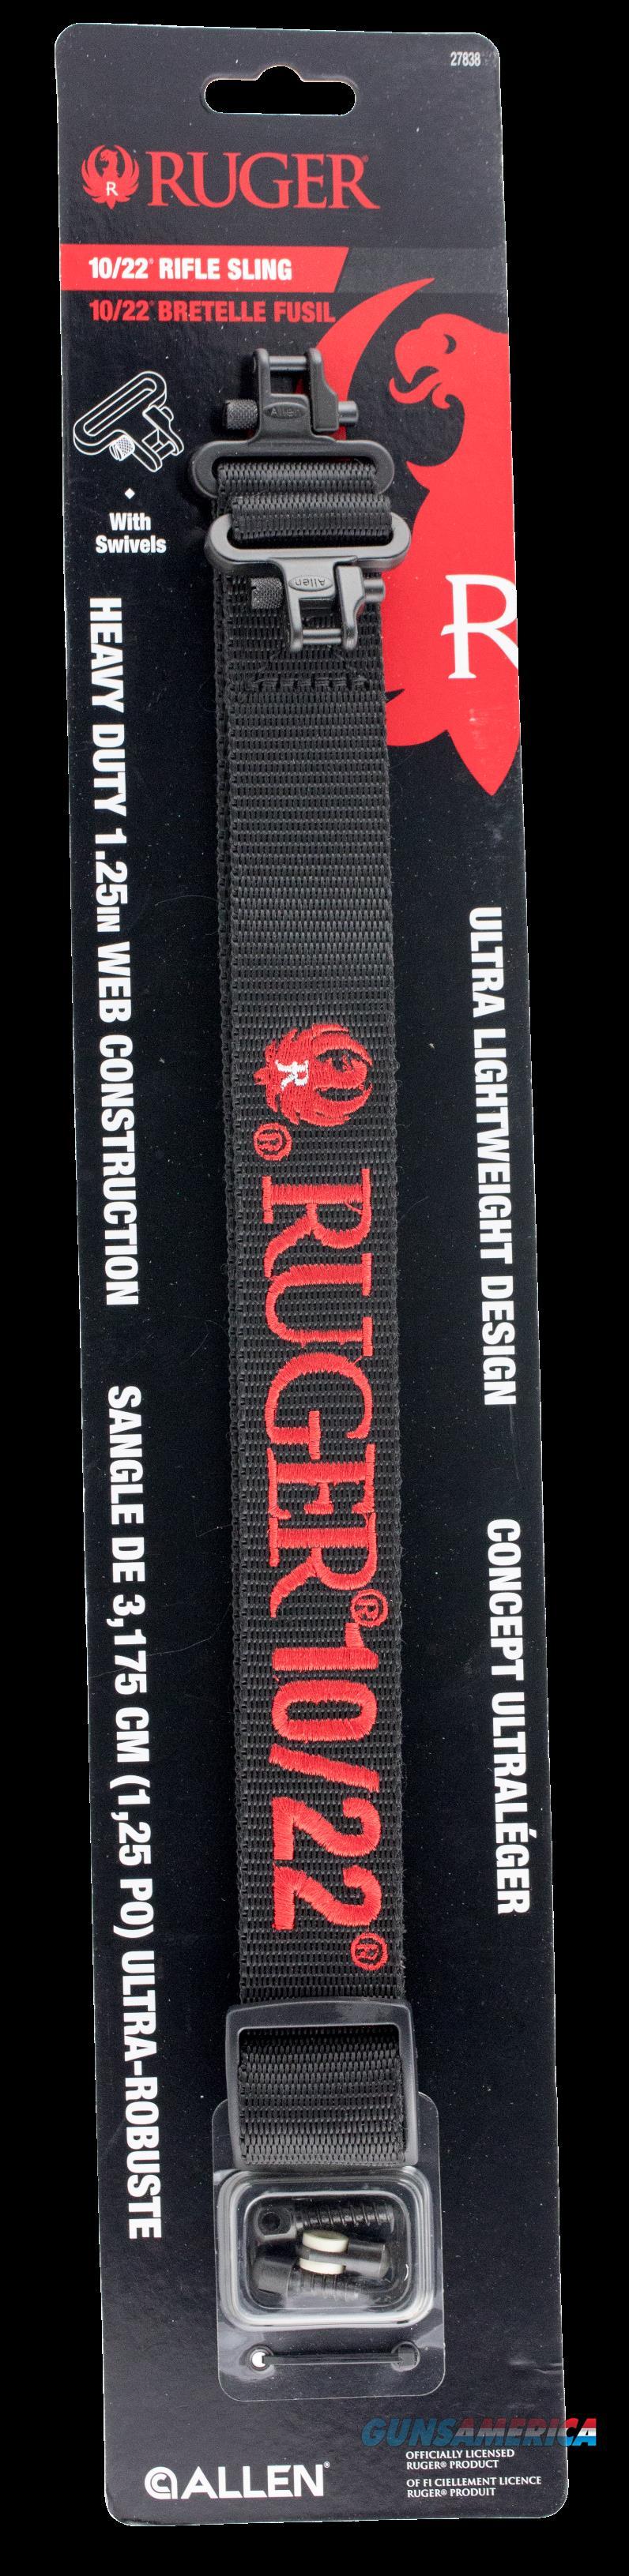 Allen Ruger, Allen 27838 Ruger 1022 Rifle Sling  Guns > Pistols > 1911 Pistol Copies (non-Colt)